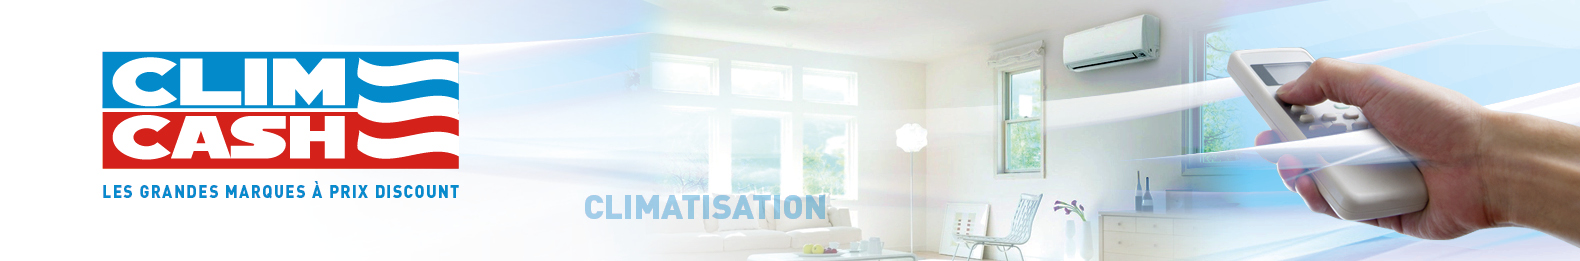 Climatiseurs Climatisation banner image